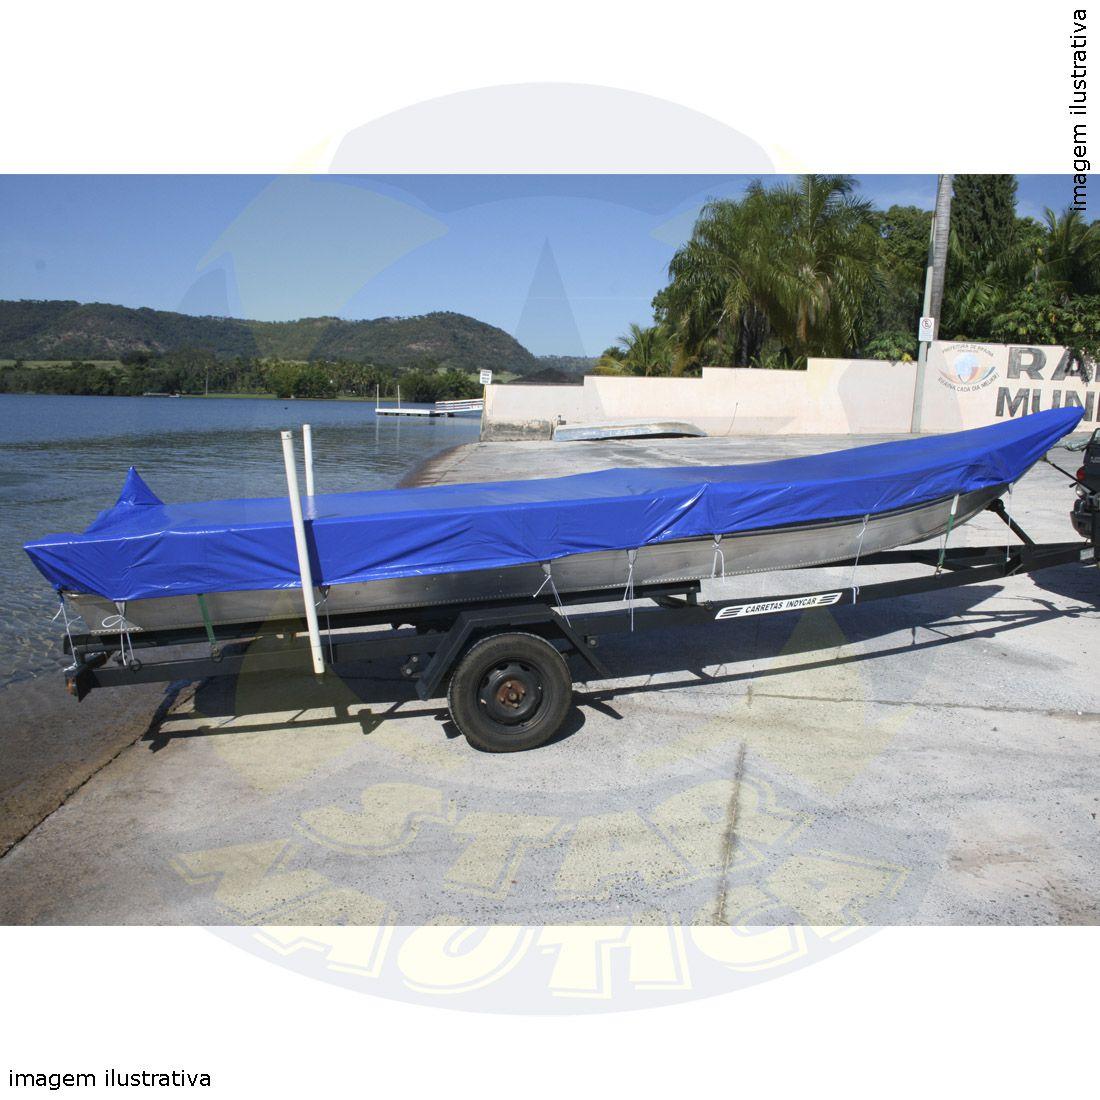 Capa Lona de Cobertura Barco Marfim 600 Lona Poliéster